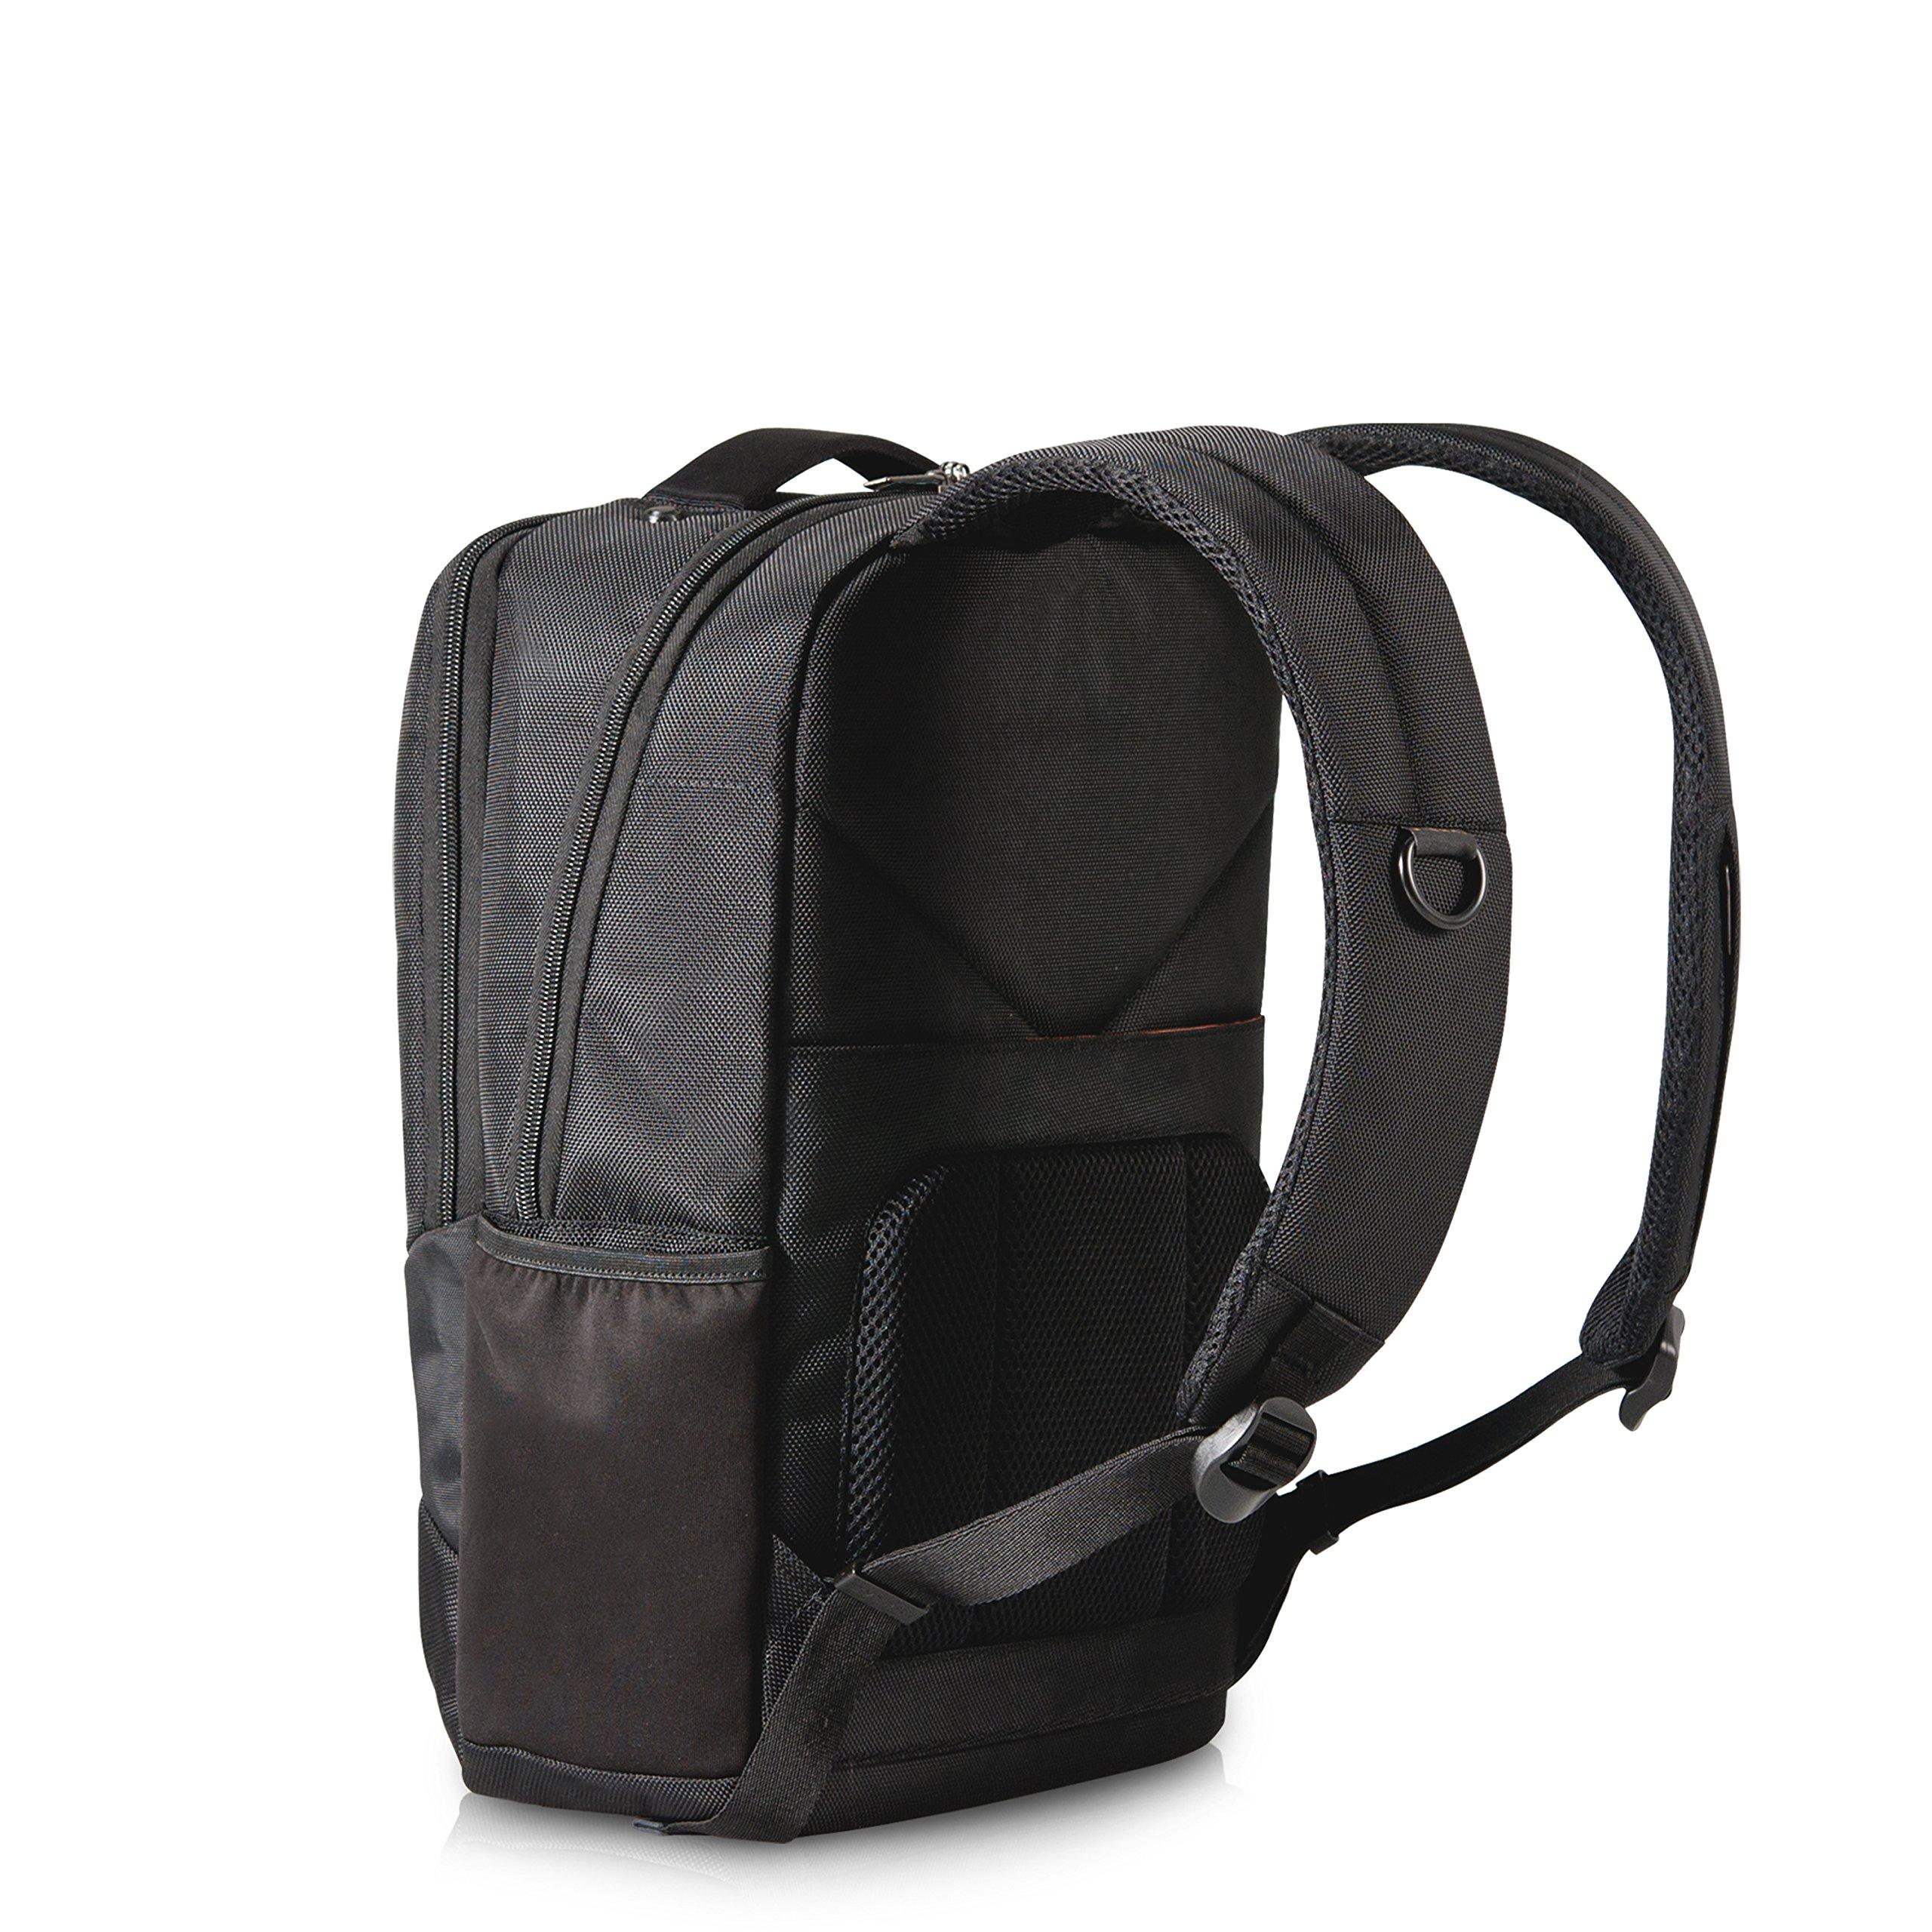 Everki Studio Slim Laptop Backpack for upto 14.1-Inch Laptops/15-Inch MacBook Pro (EKP118) by Everki (Image #4)